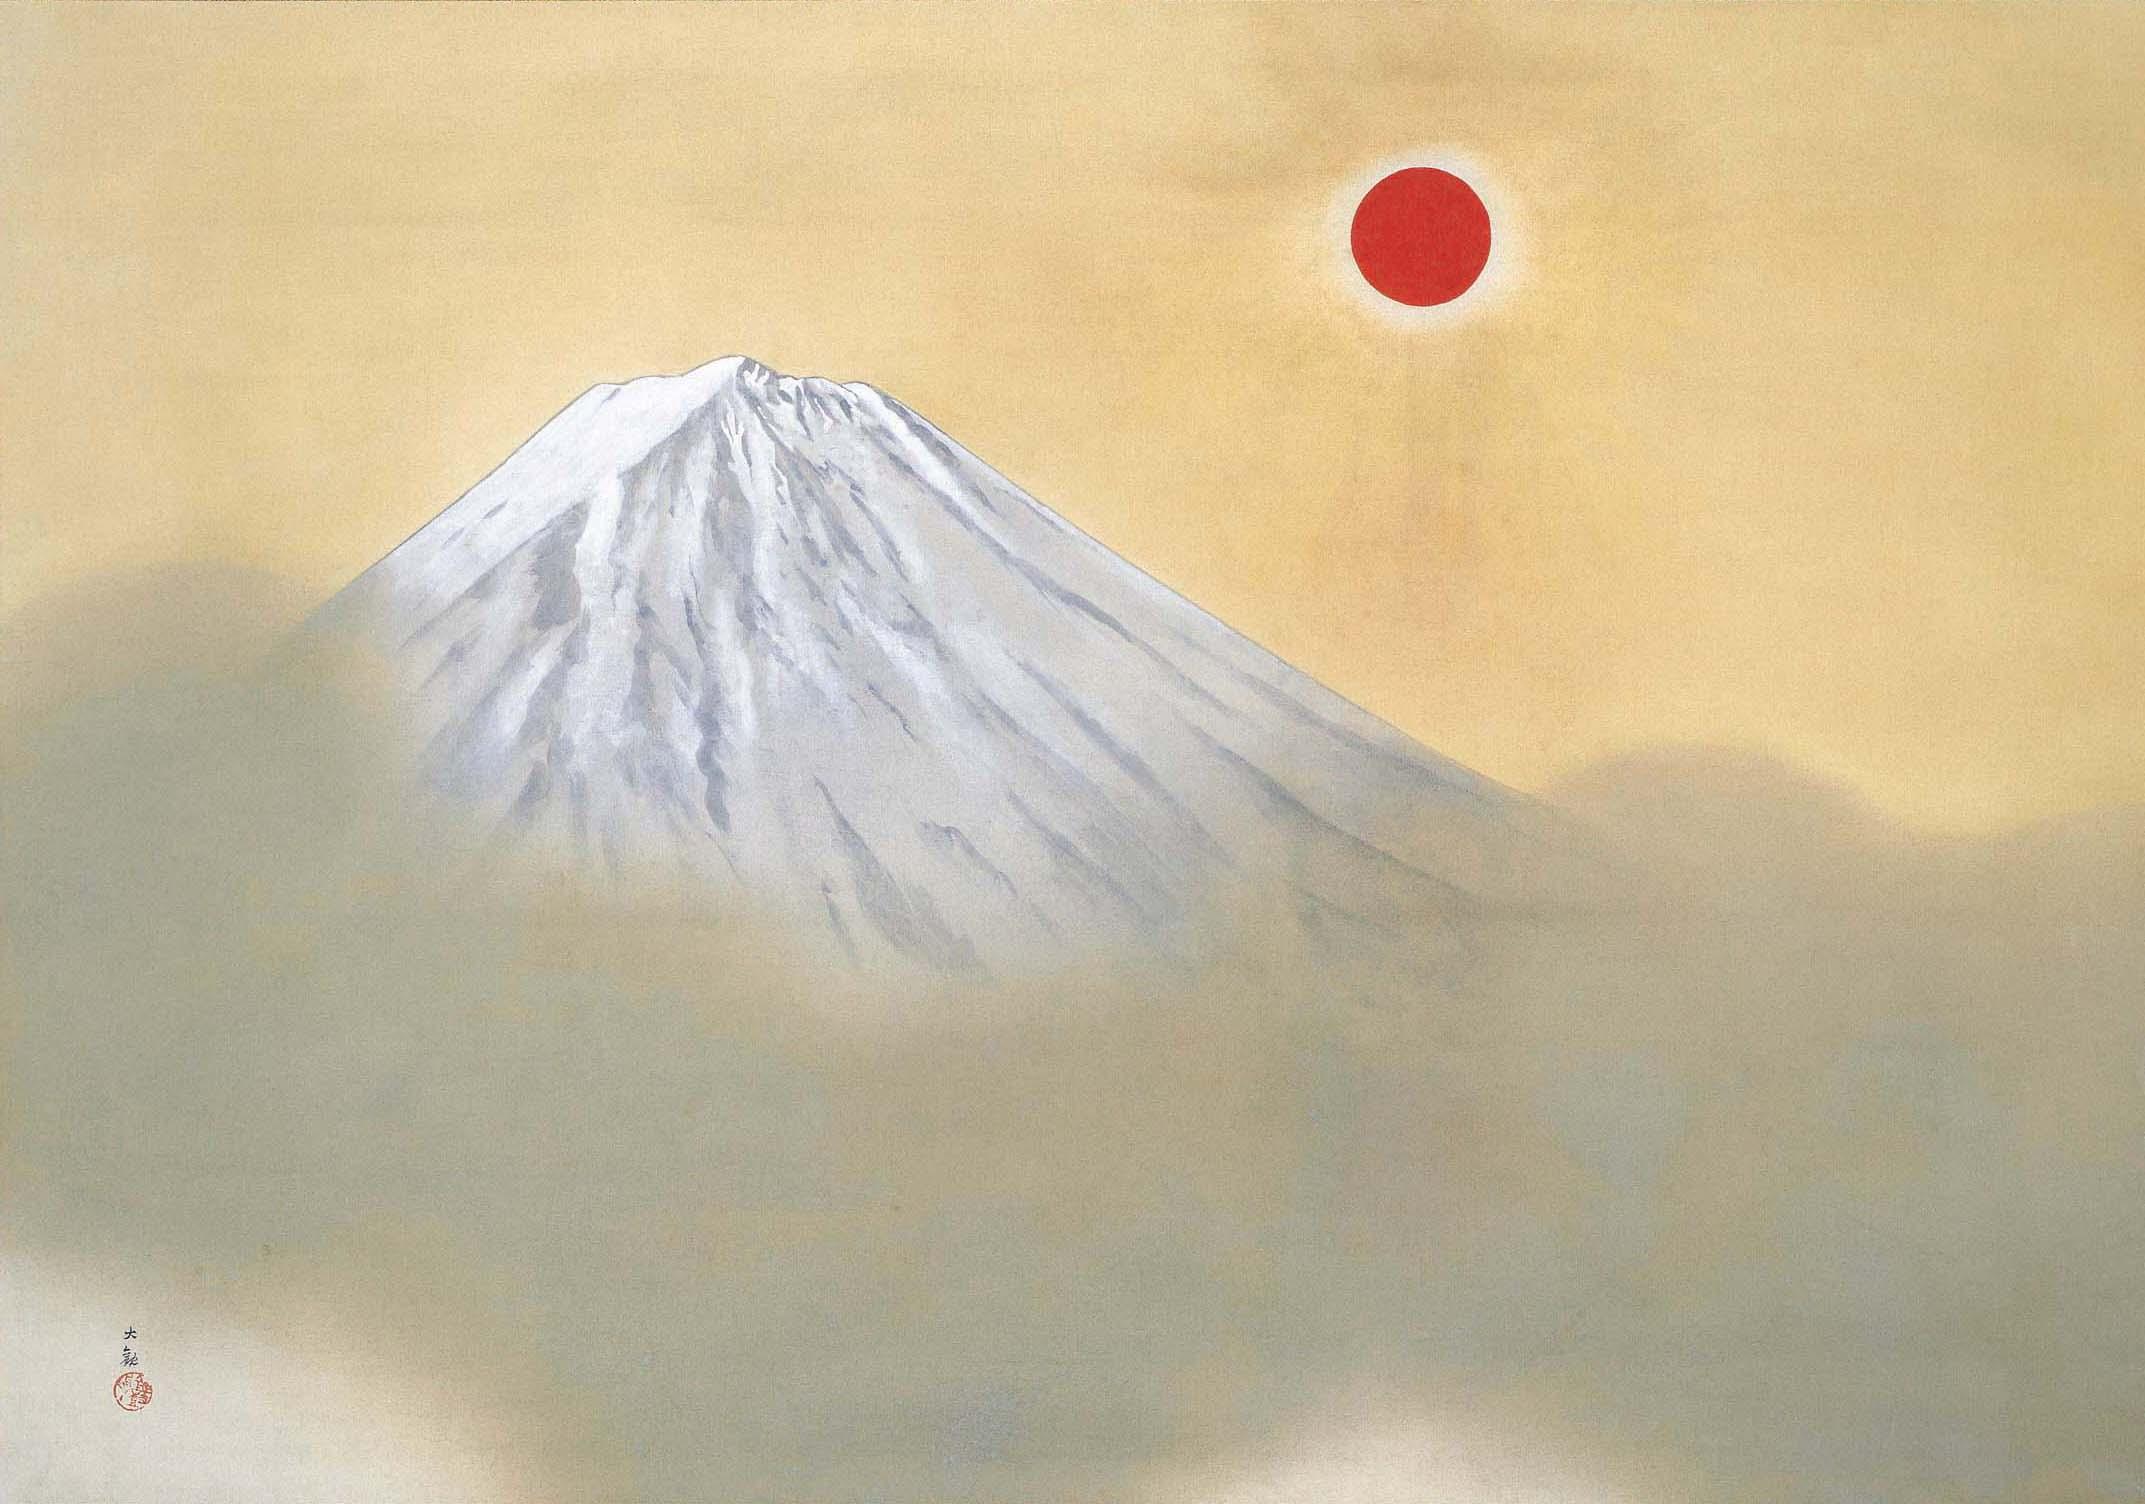 'Mt. Fuji' by Yokoyama Taikan (1868-1958) | ADACHI MUSEUM OF ART